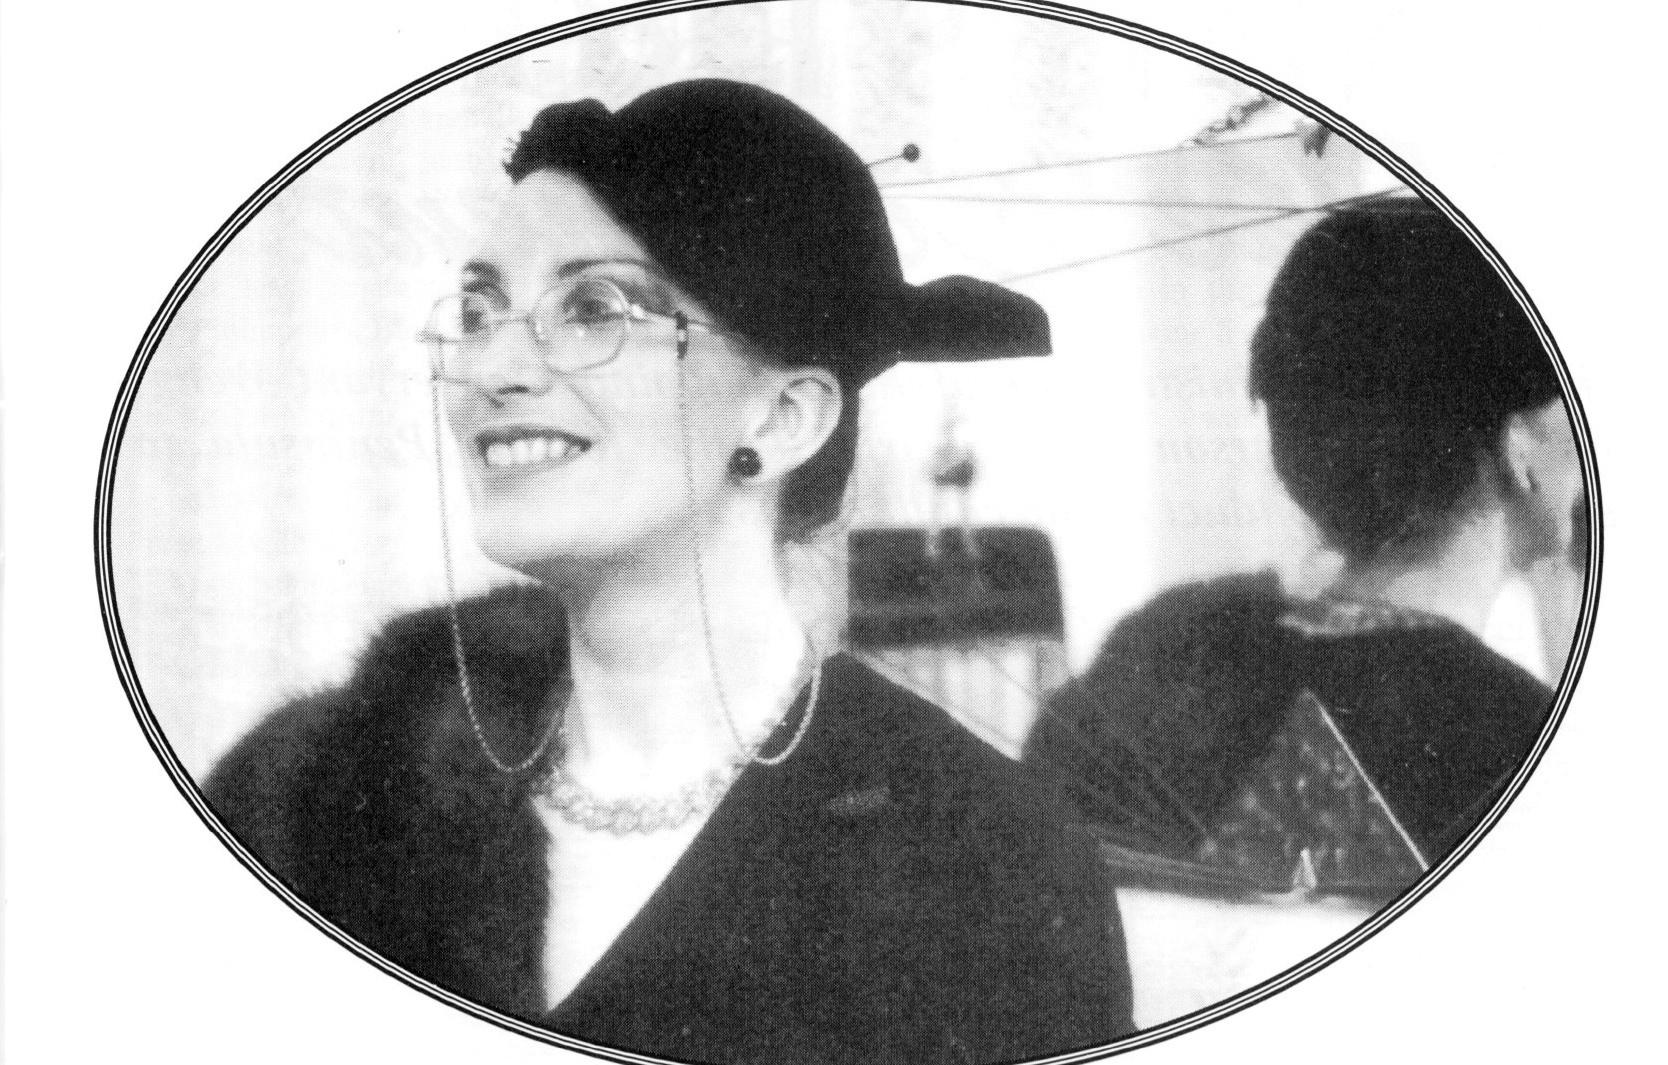 Marianne Martindal